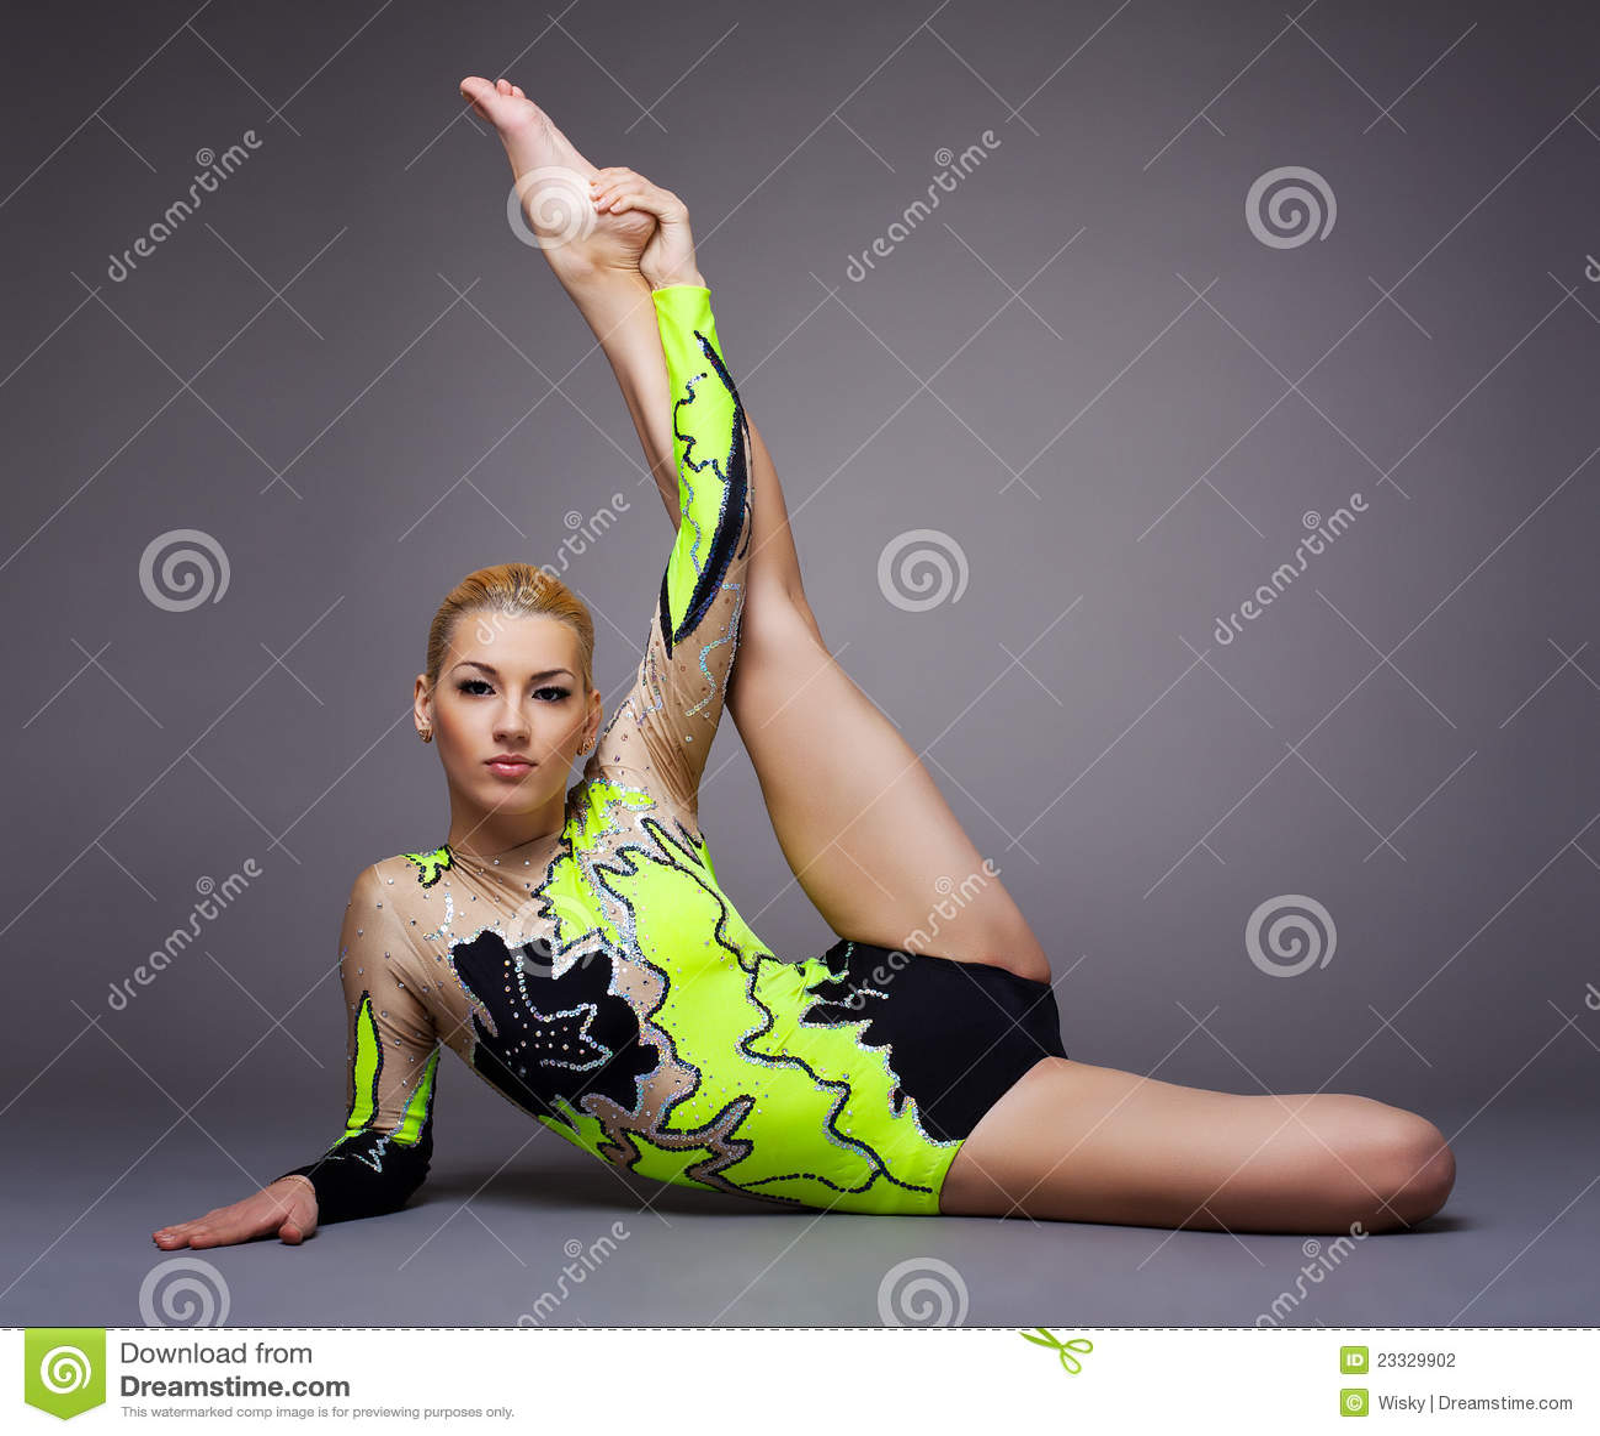 hot nude amateurs doing splits